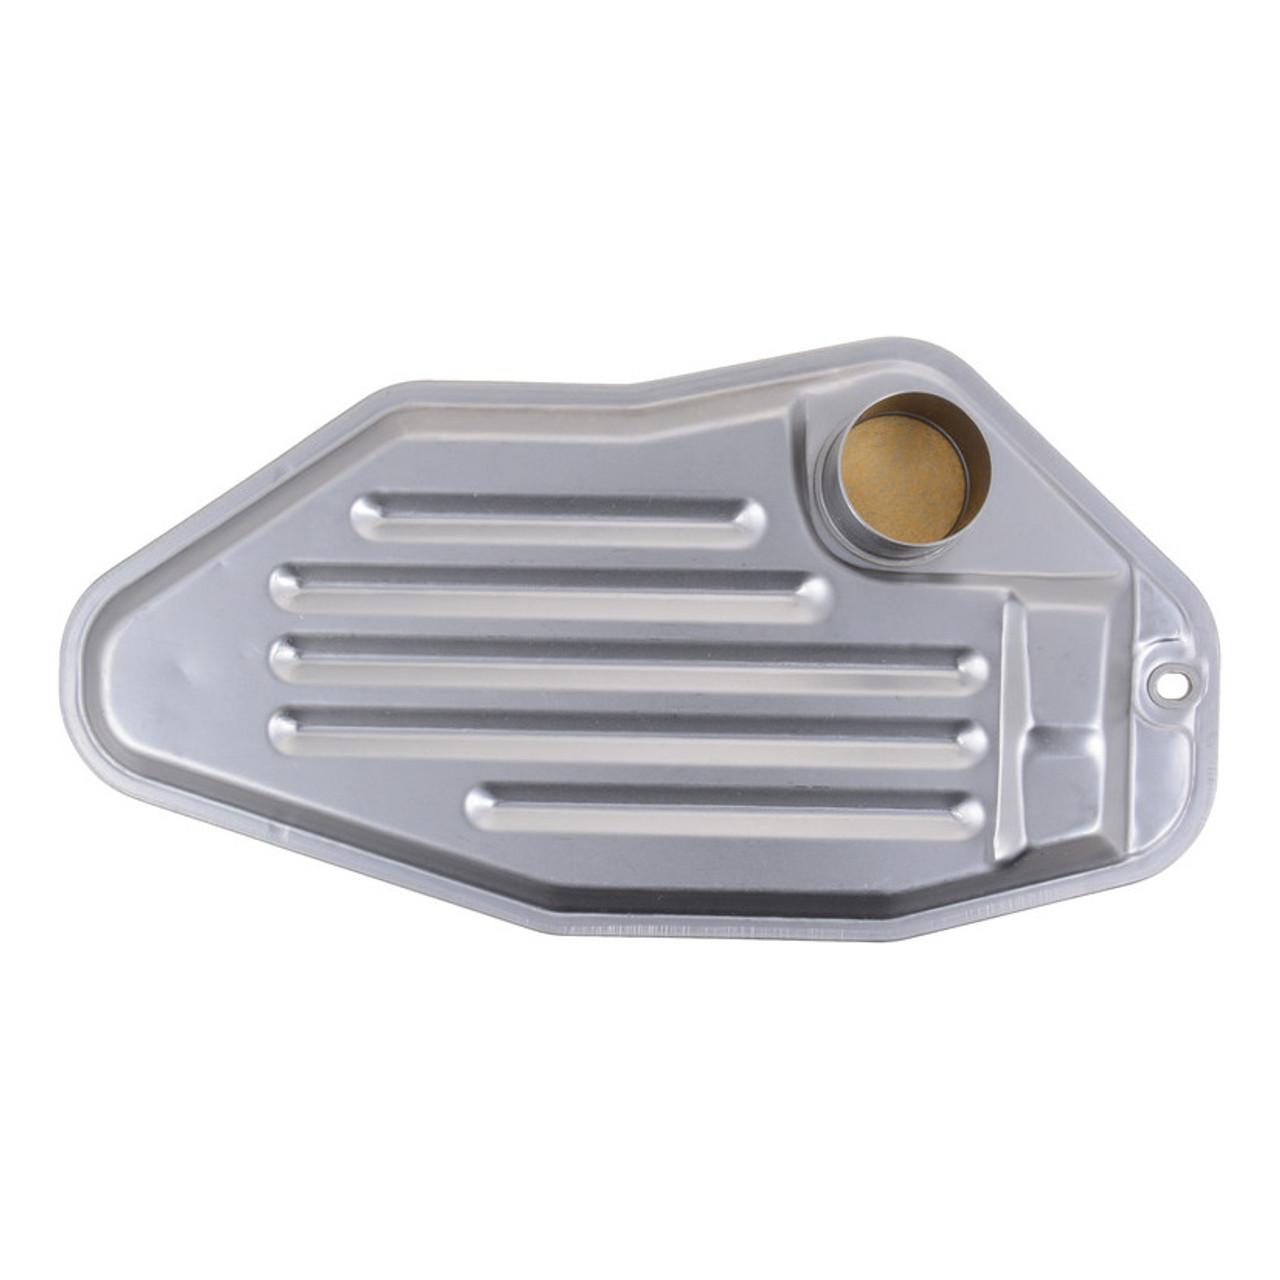 44710 (Shallow Pan Filter) Bottom View